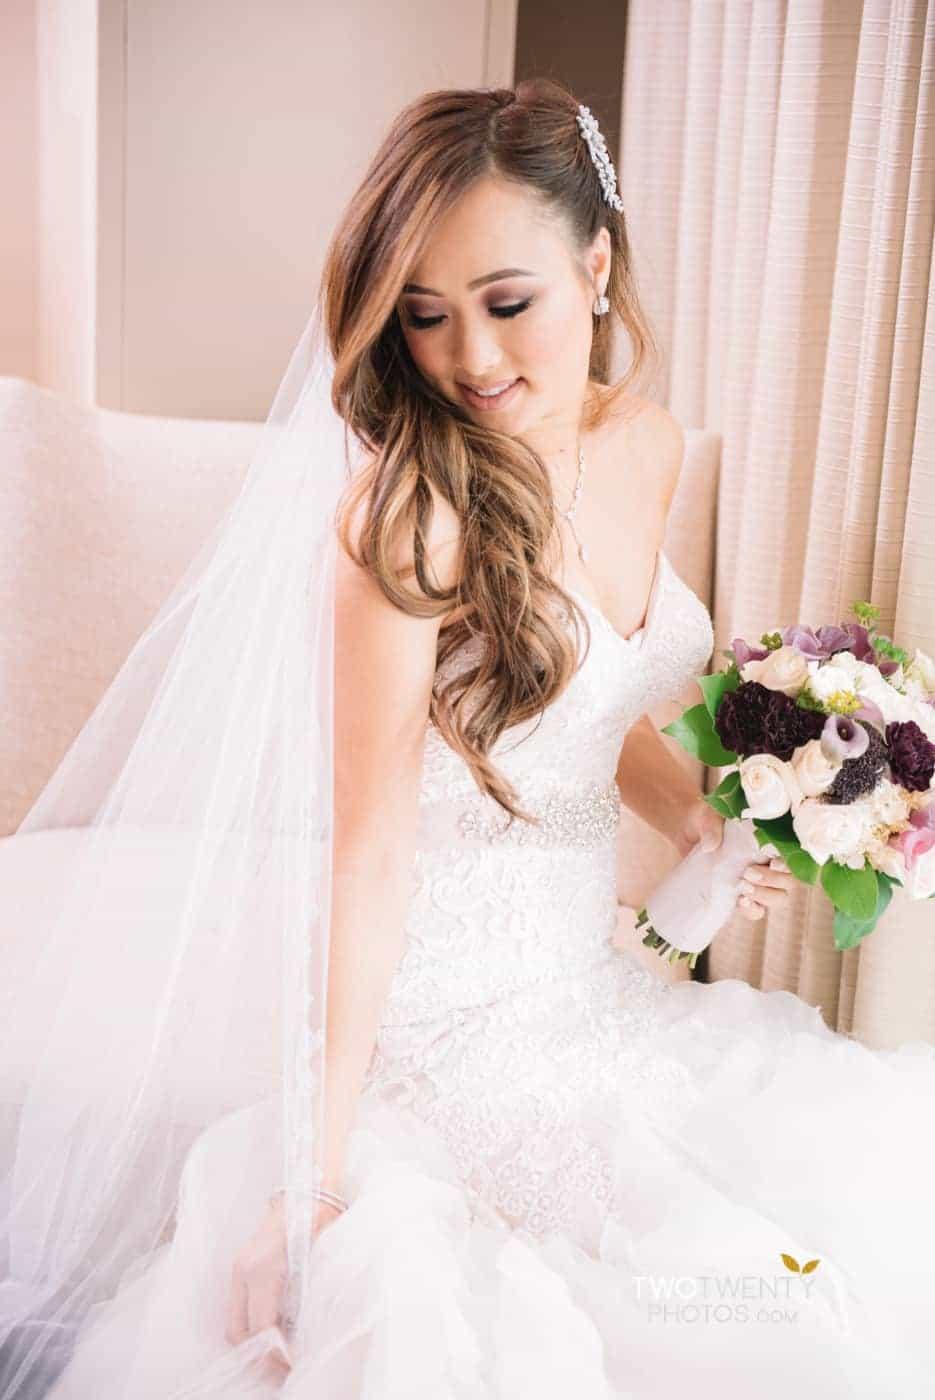 hyatt-regency-downtown-sacramento-wedding-photographer-33